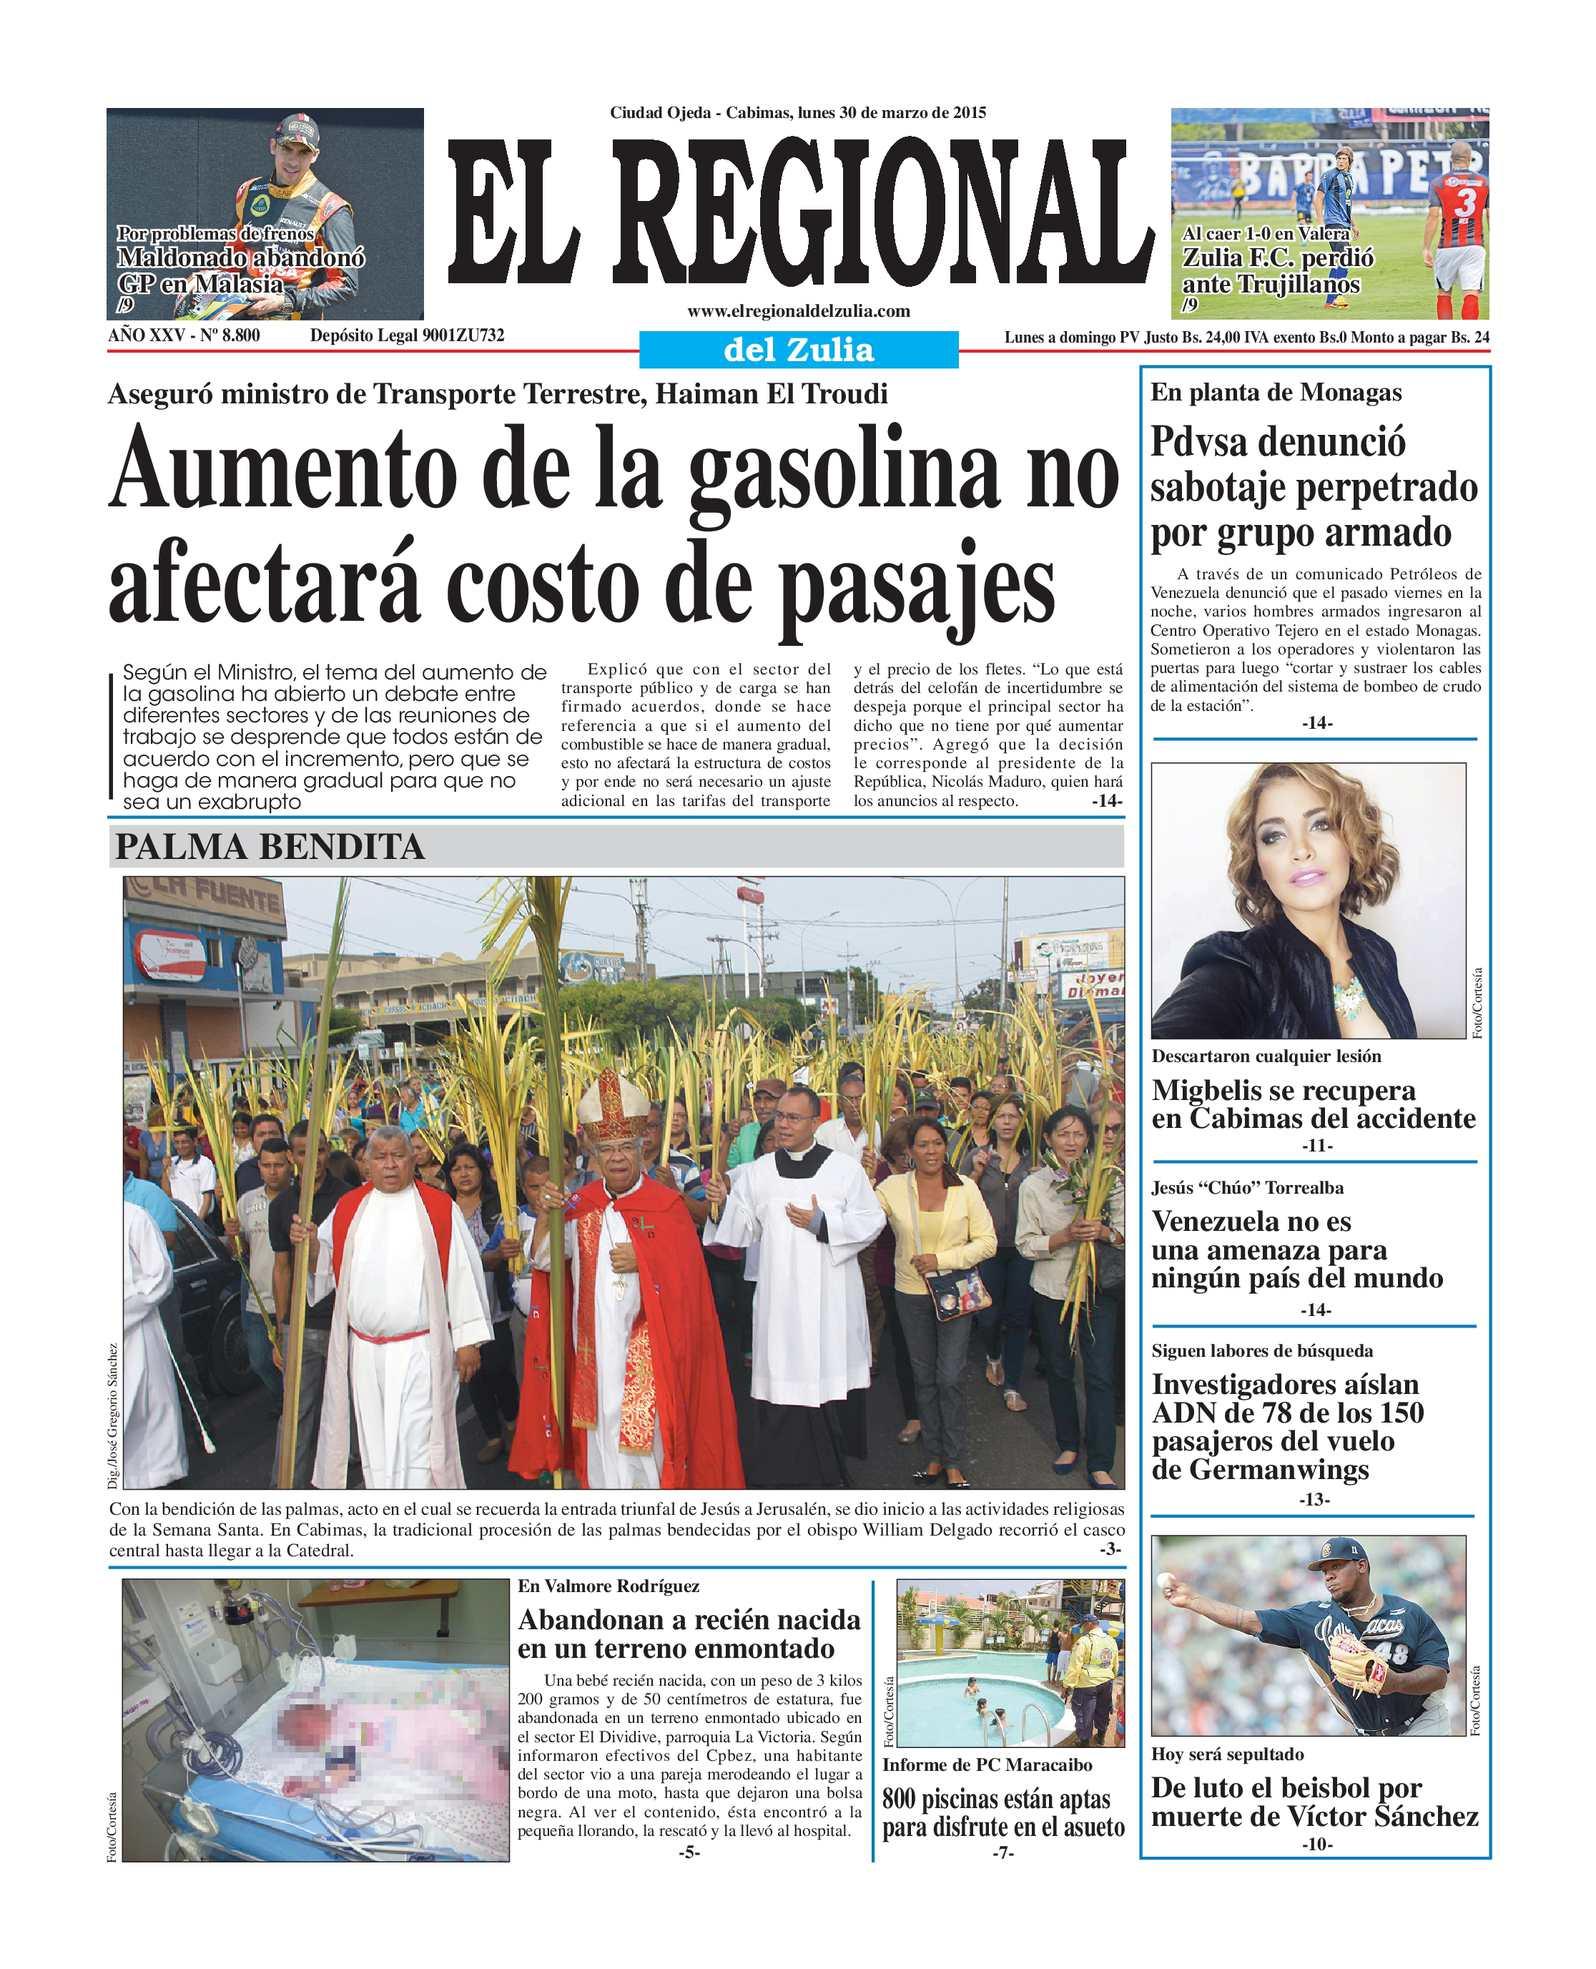 Calaméo - El Regional del Zulia 30-03-2015